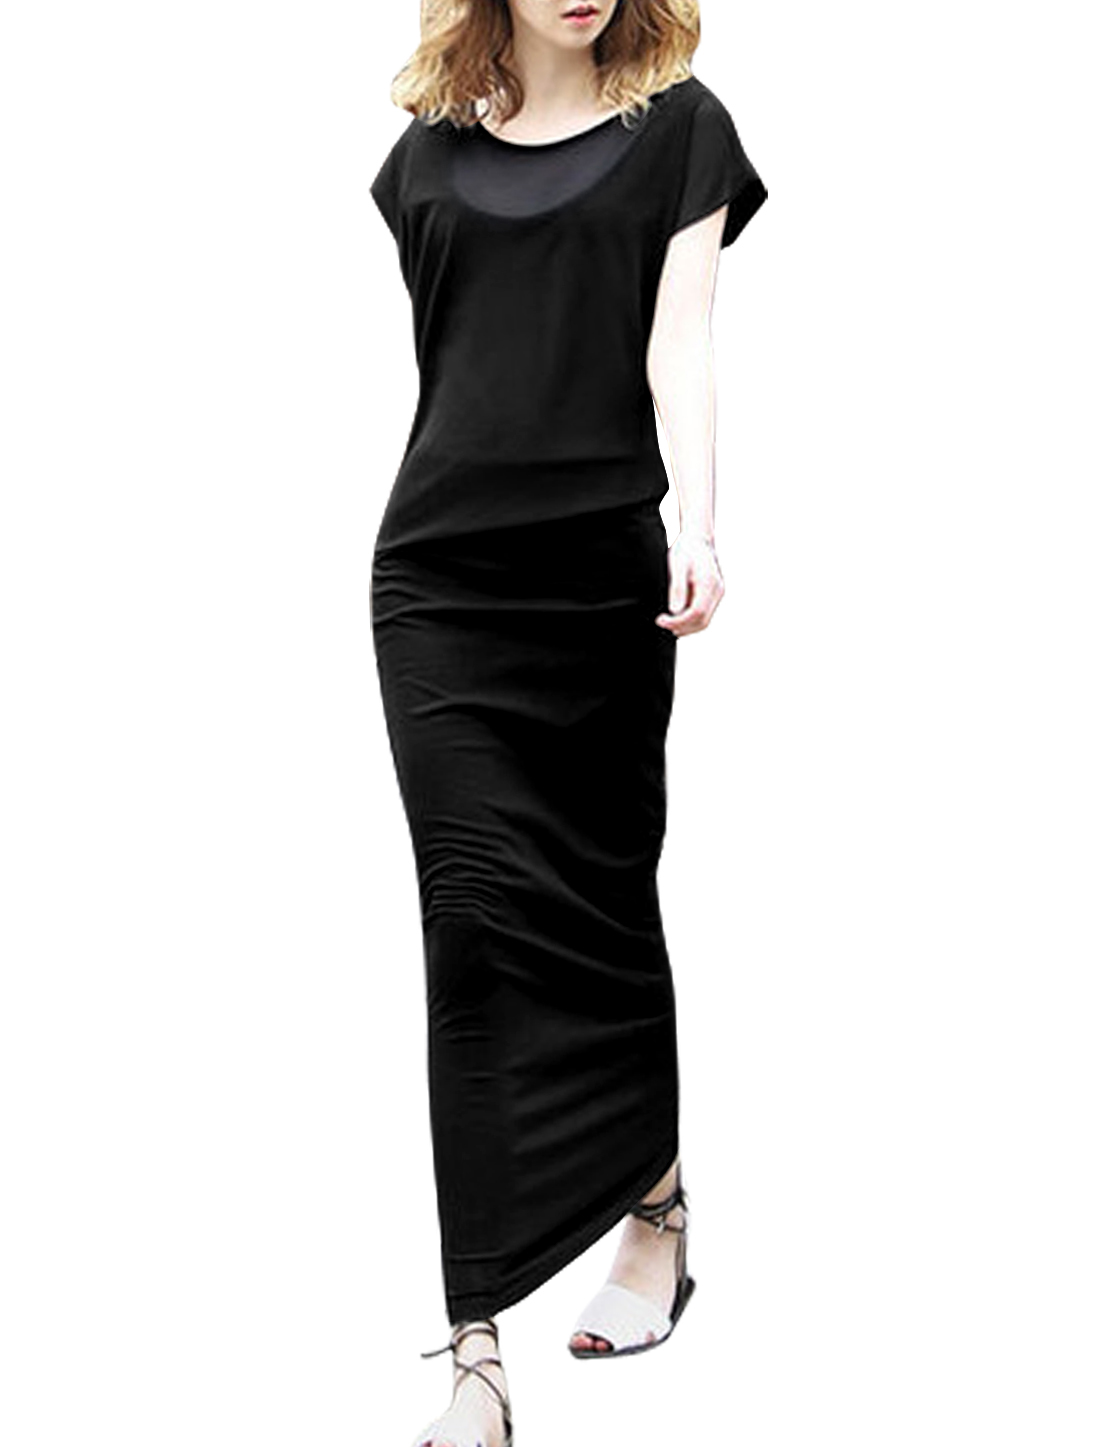 Women Cap Sleeve Layered Chiffon Paneled Casual Maxi Dress Black S